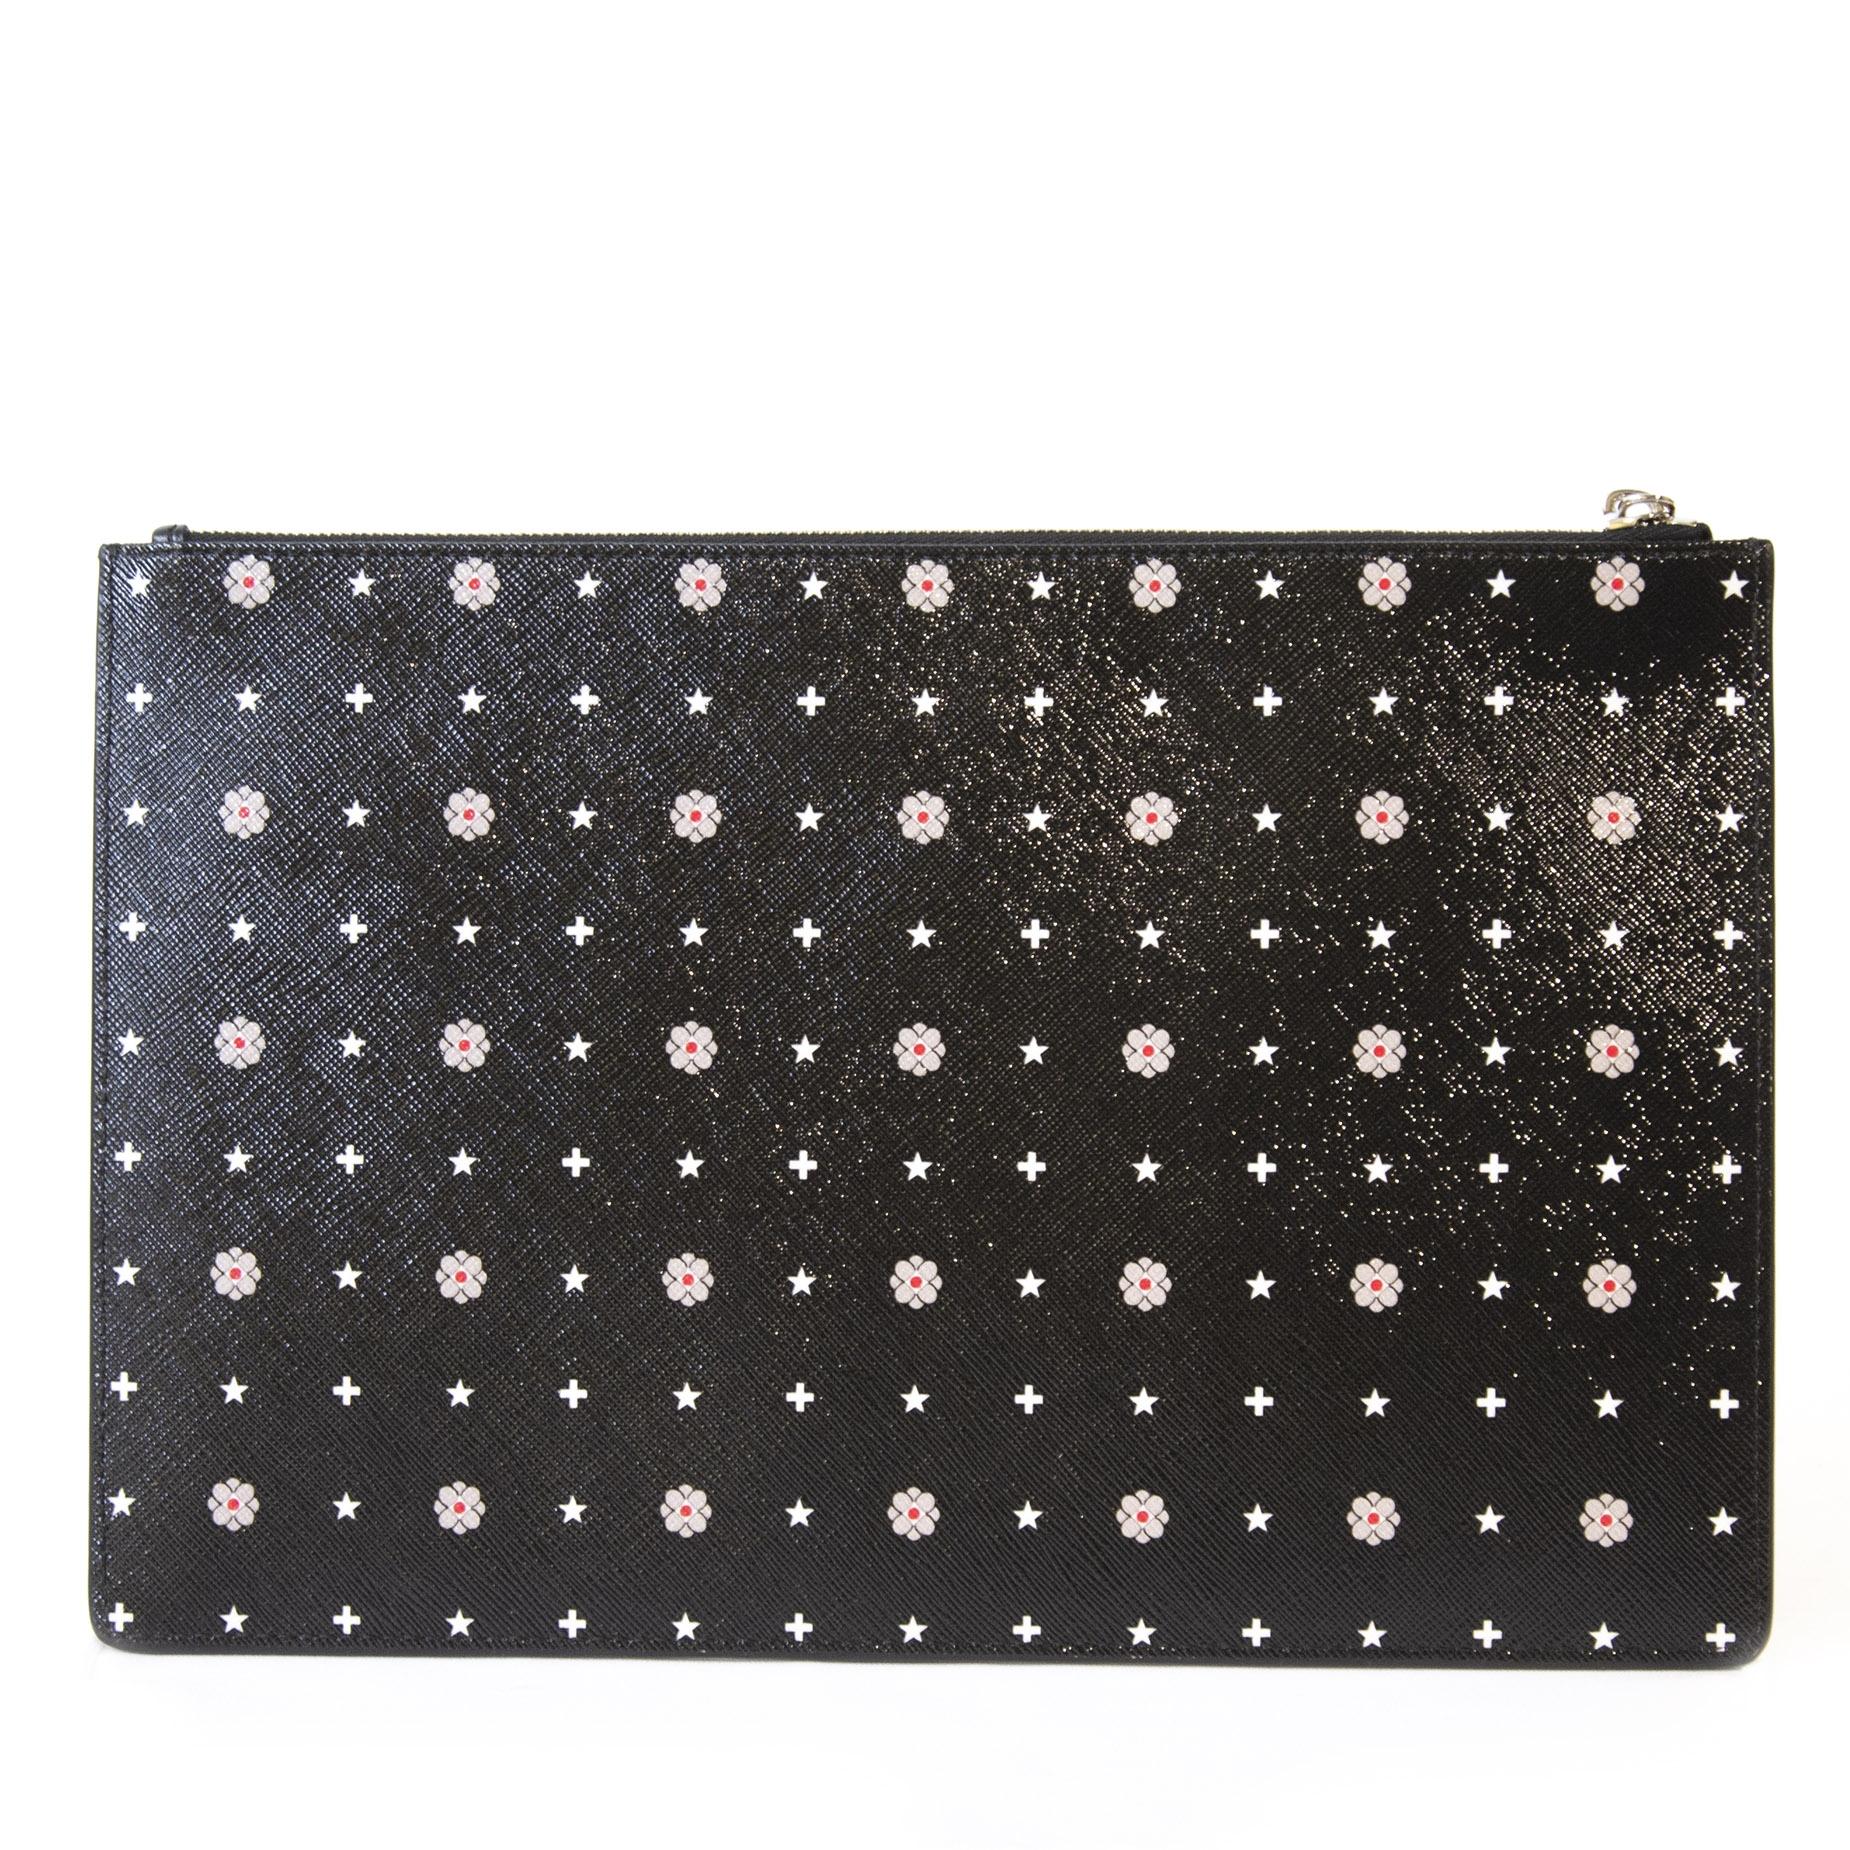 Authentieke tweedehands vintage Givenchy Floral Pouch  koop online webshop LabelLOV